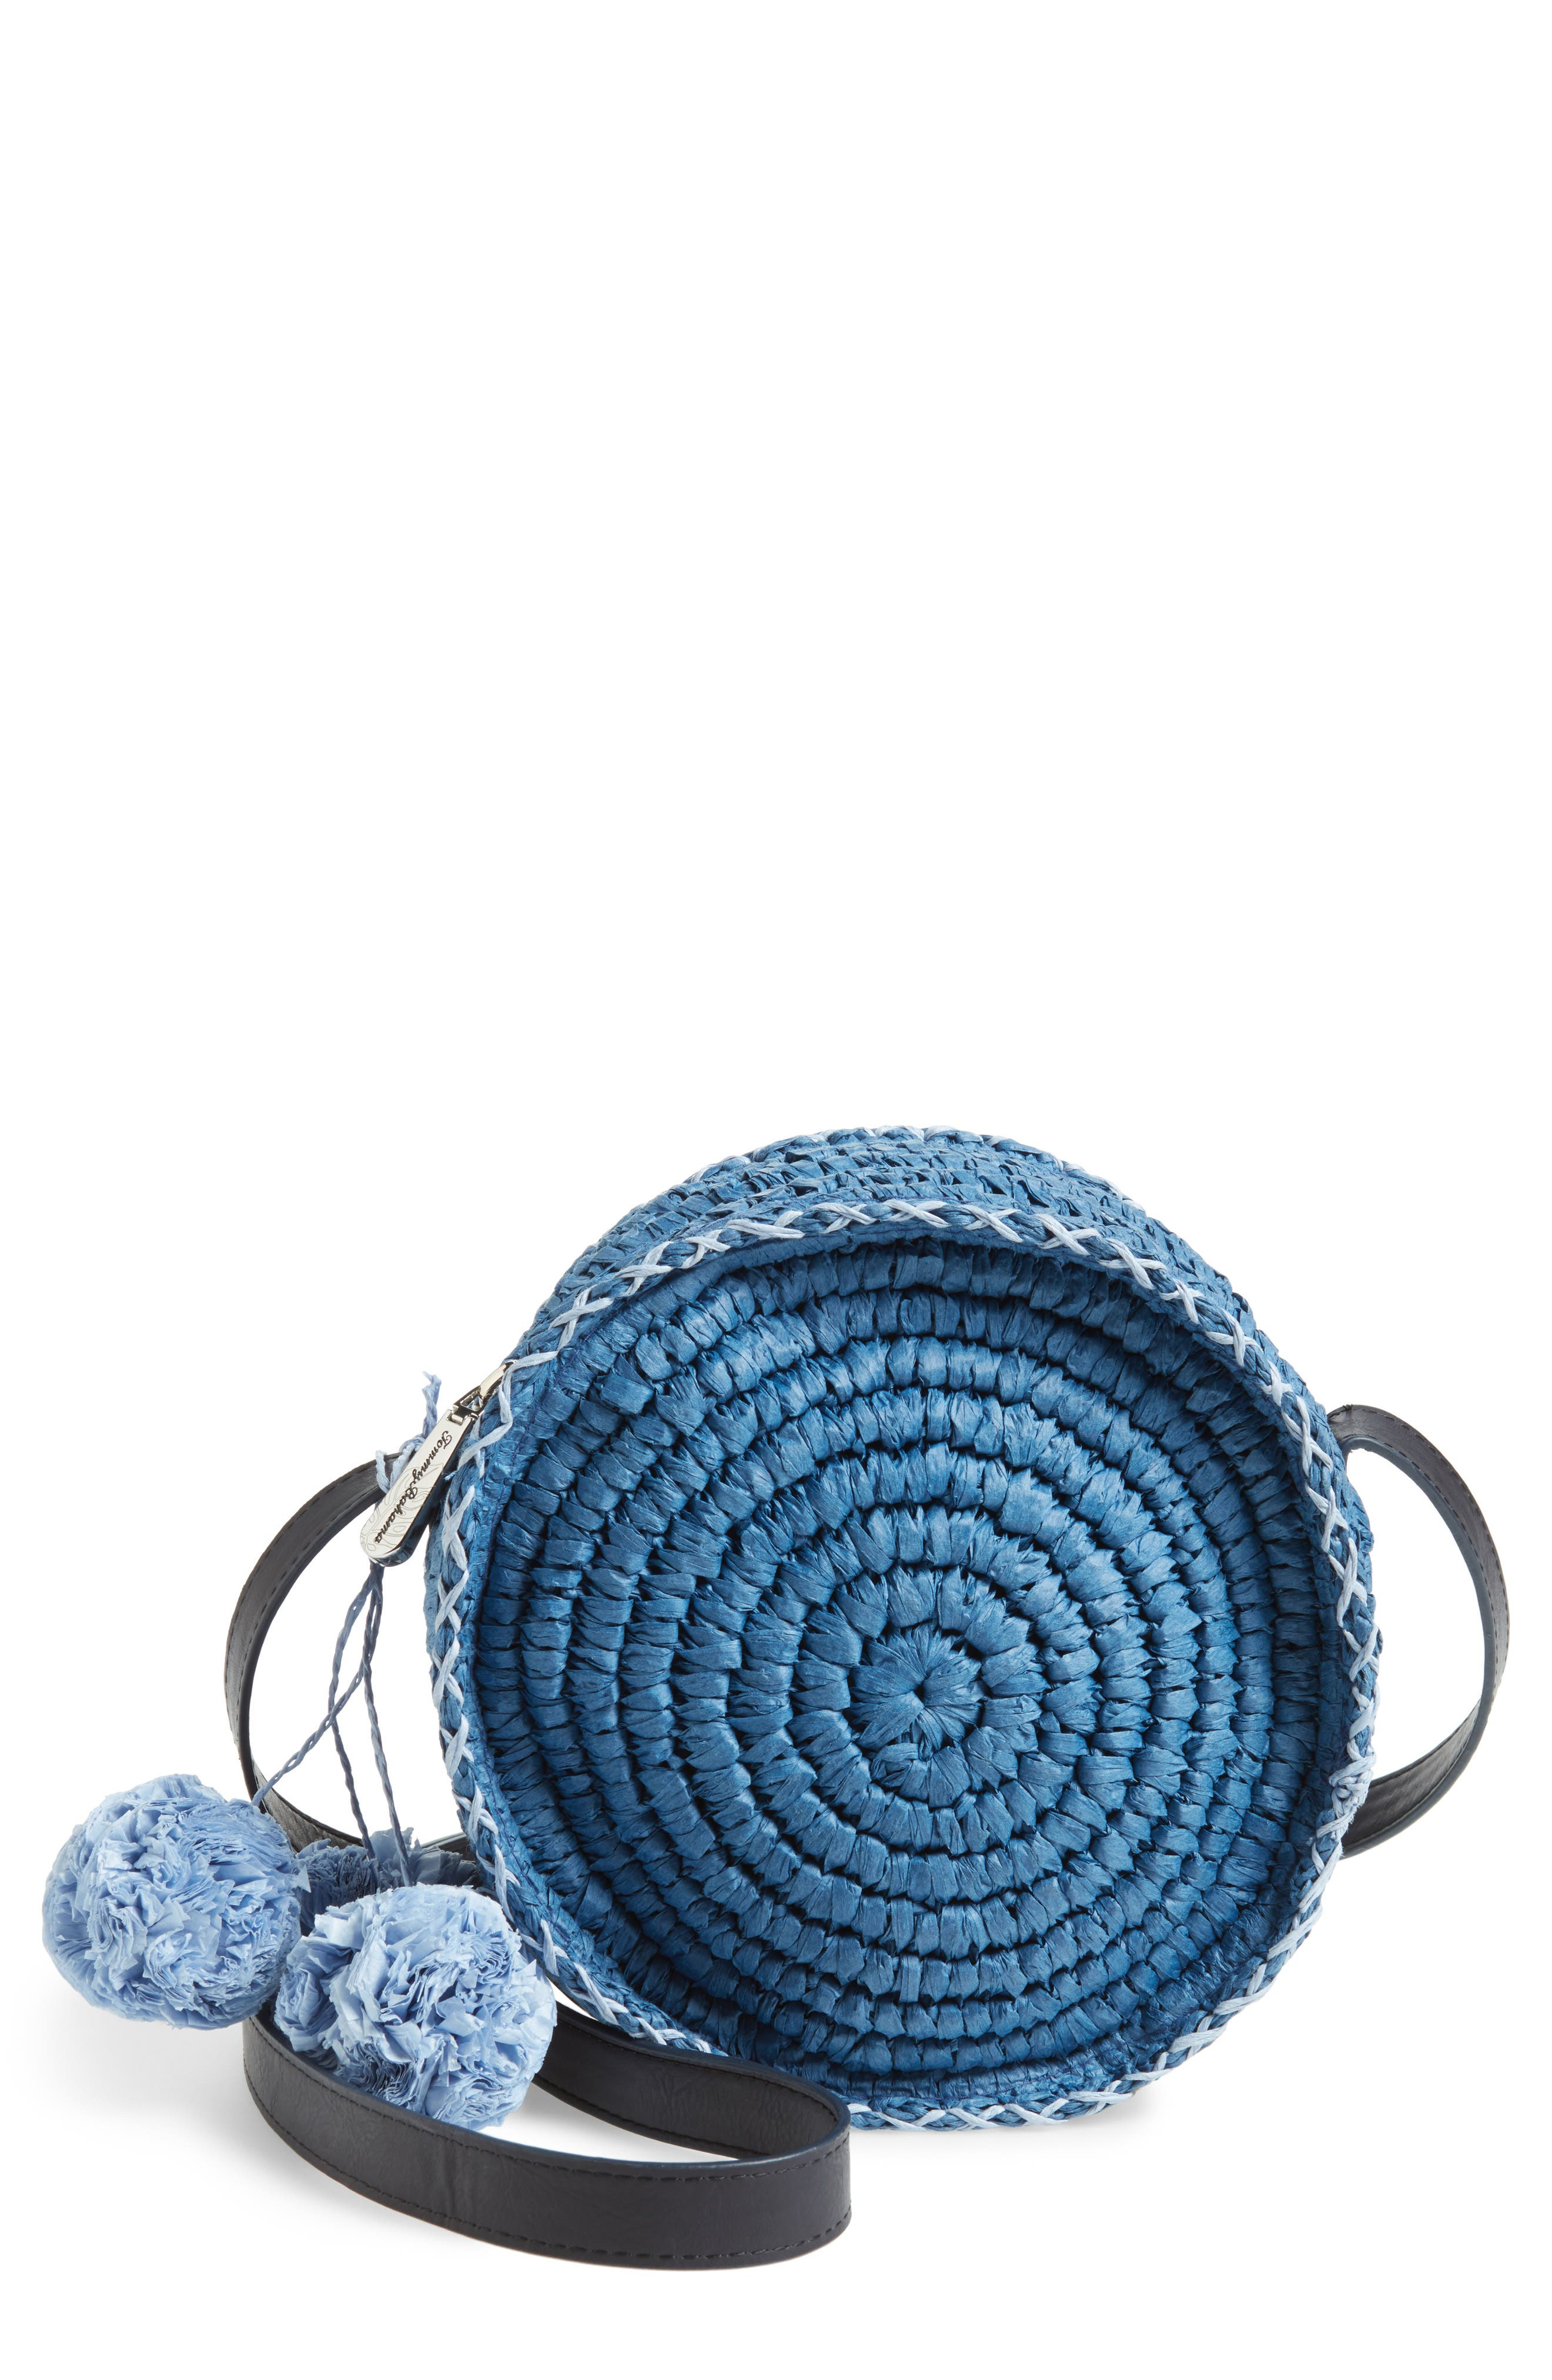 Pirro Woven Straw Crossbody Bag,                         Main,                         color, Navy